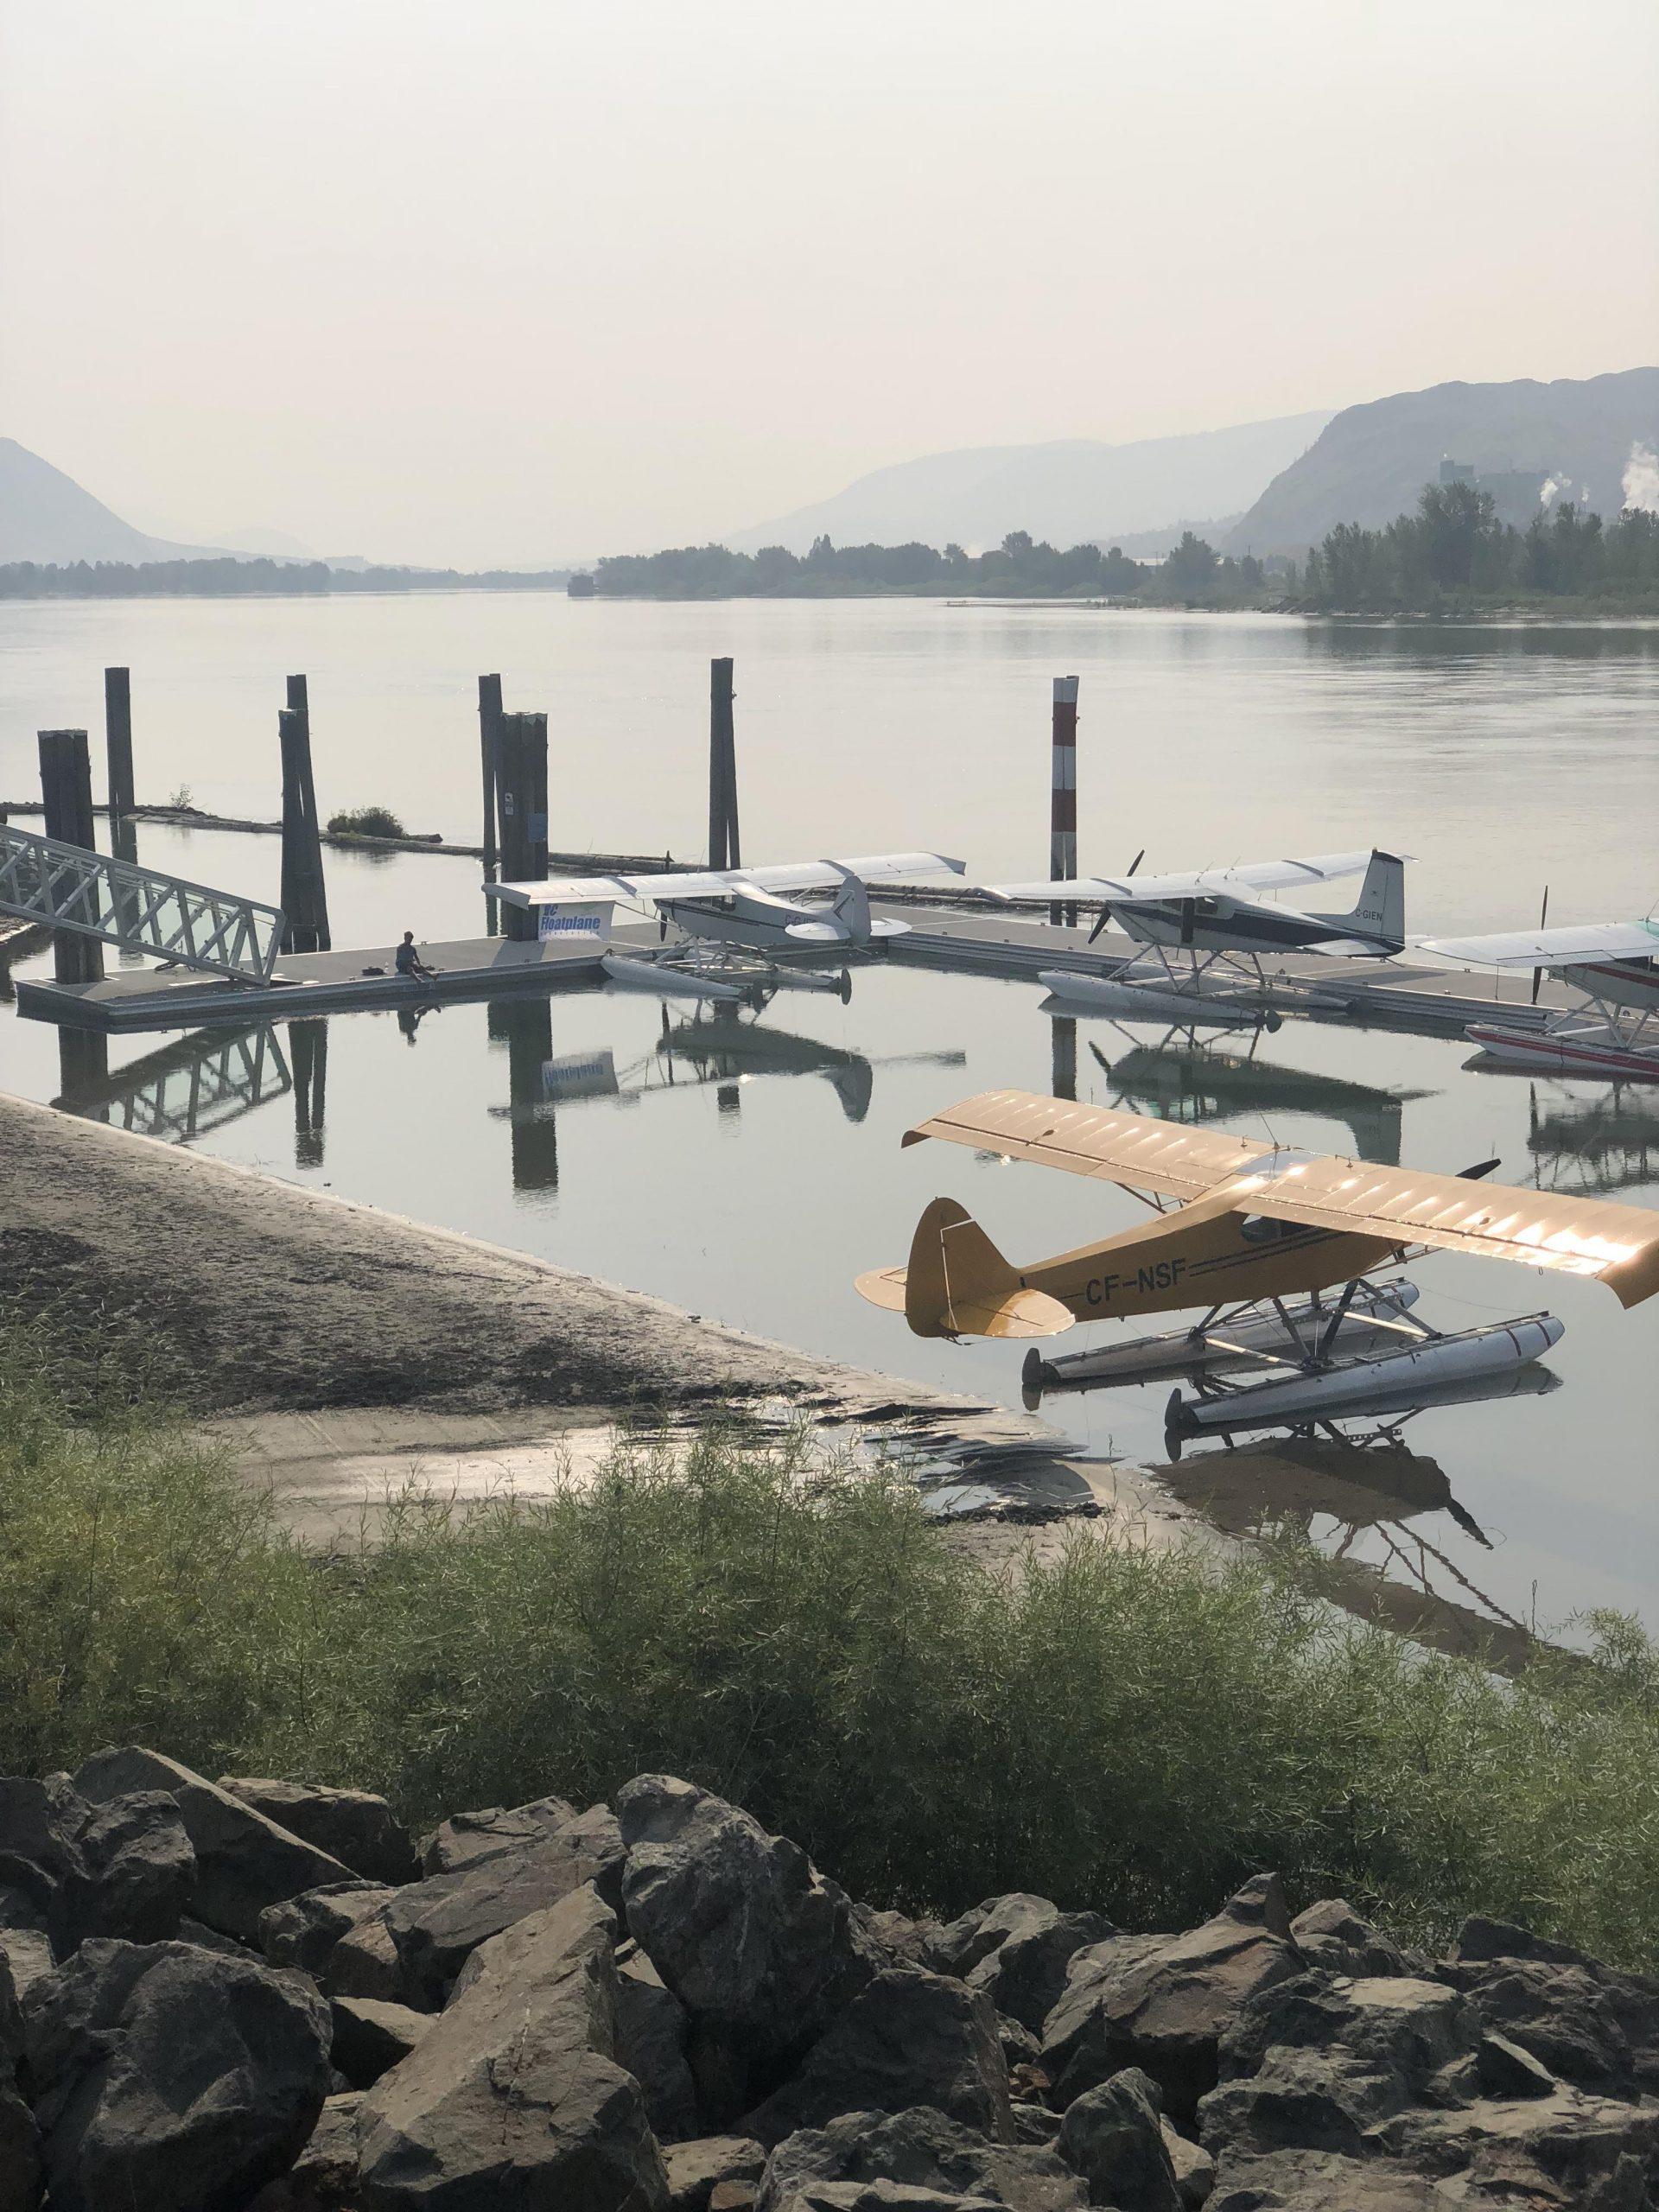 Renovated Kamloops Airport float plane dock re-opens